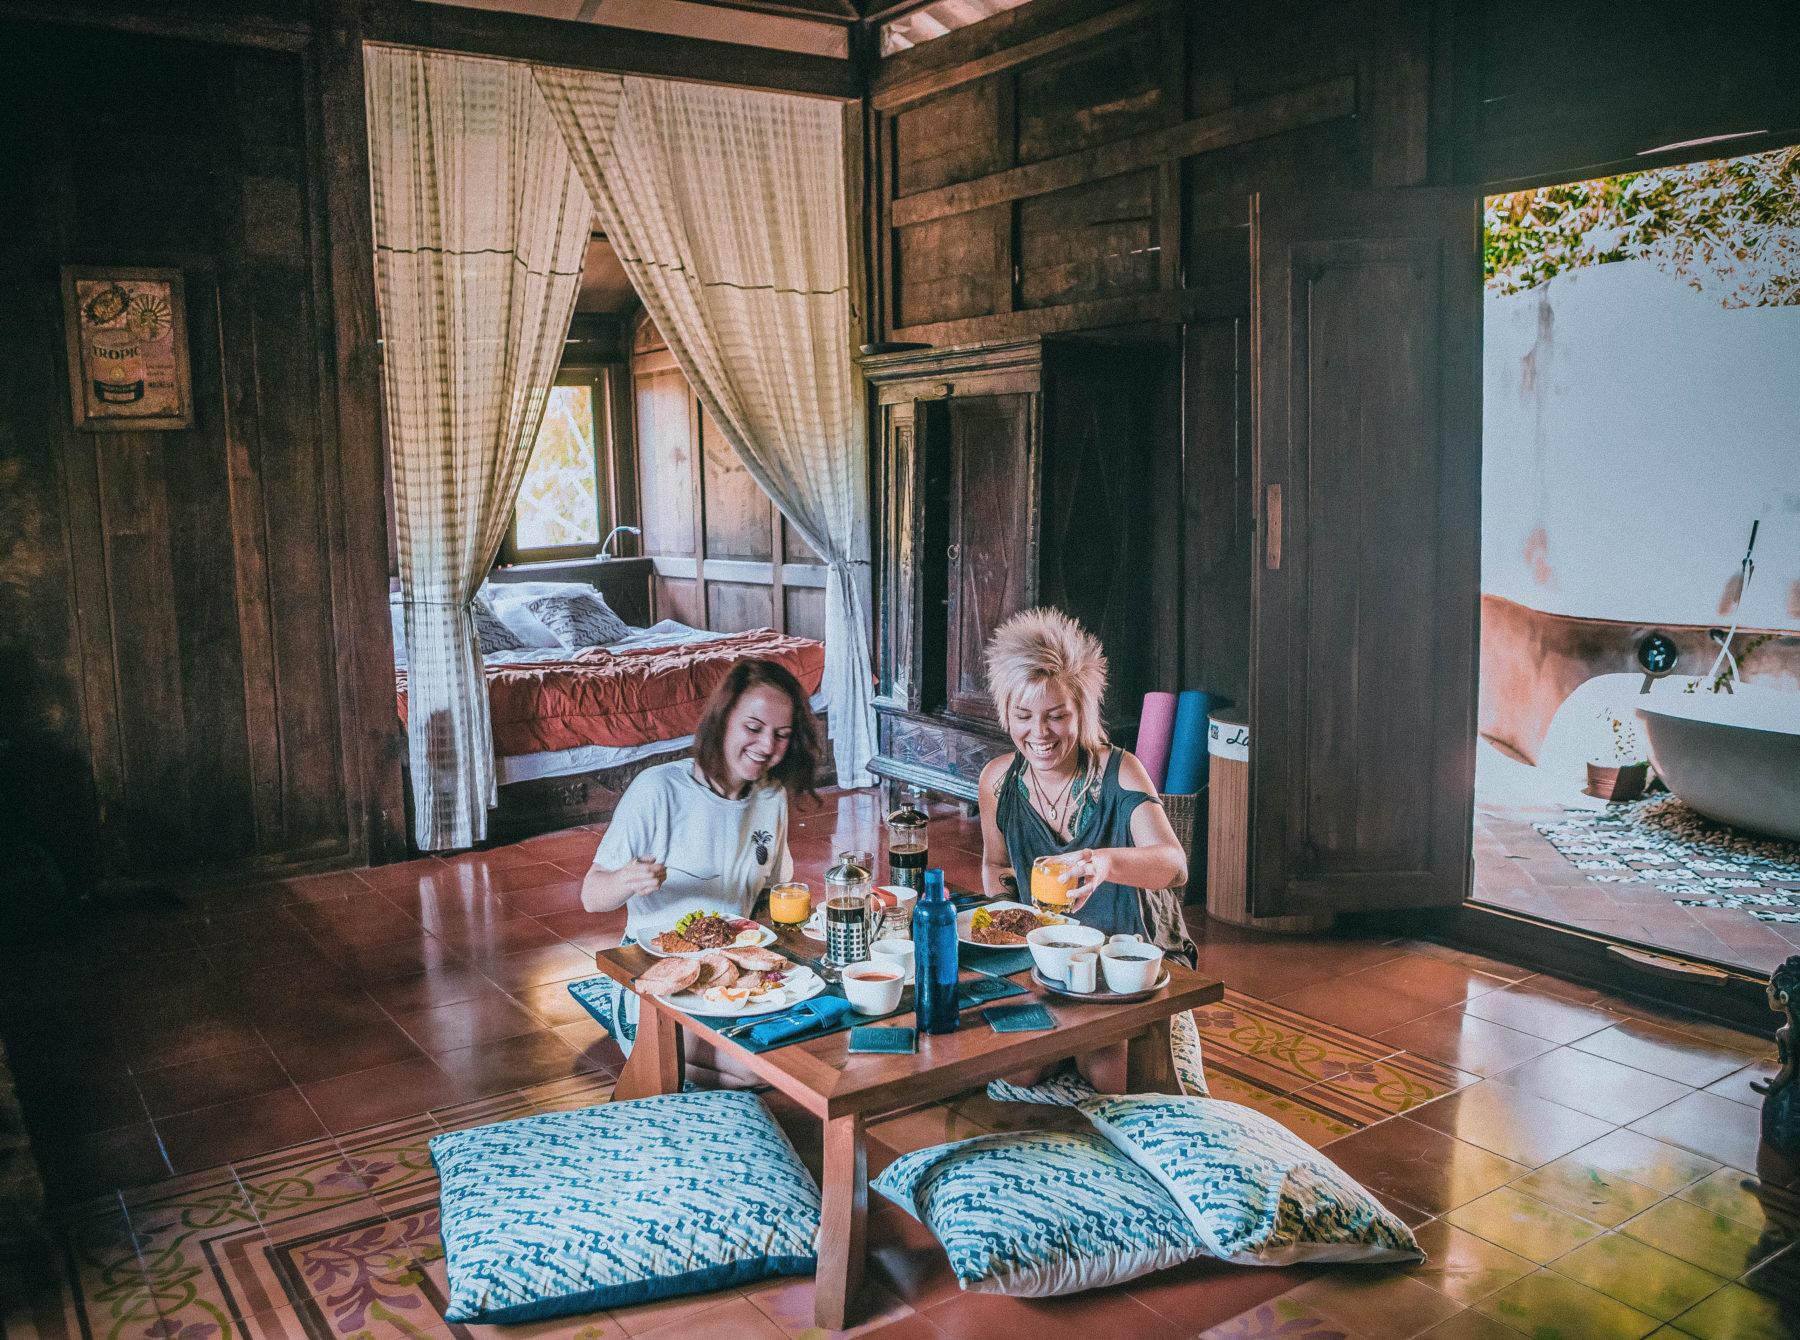 breakfast in private villa yogyakarta homestay sewon village eco lodge eco friendly vegan breakfast beautiful interior